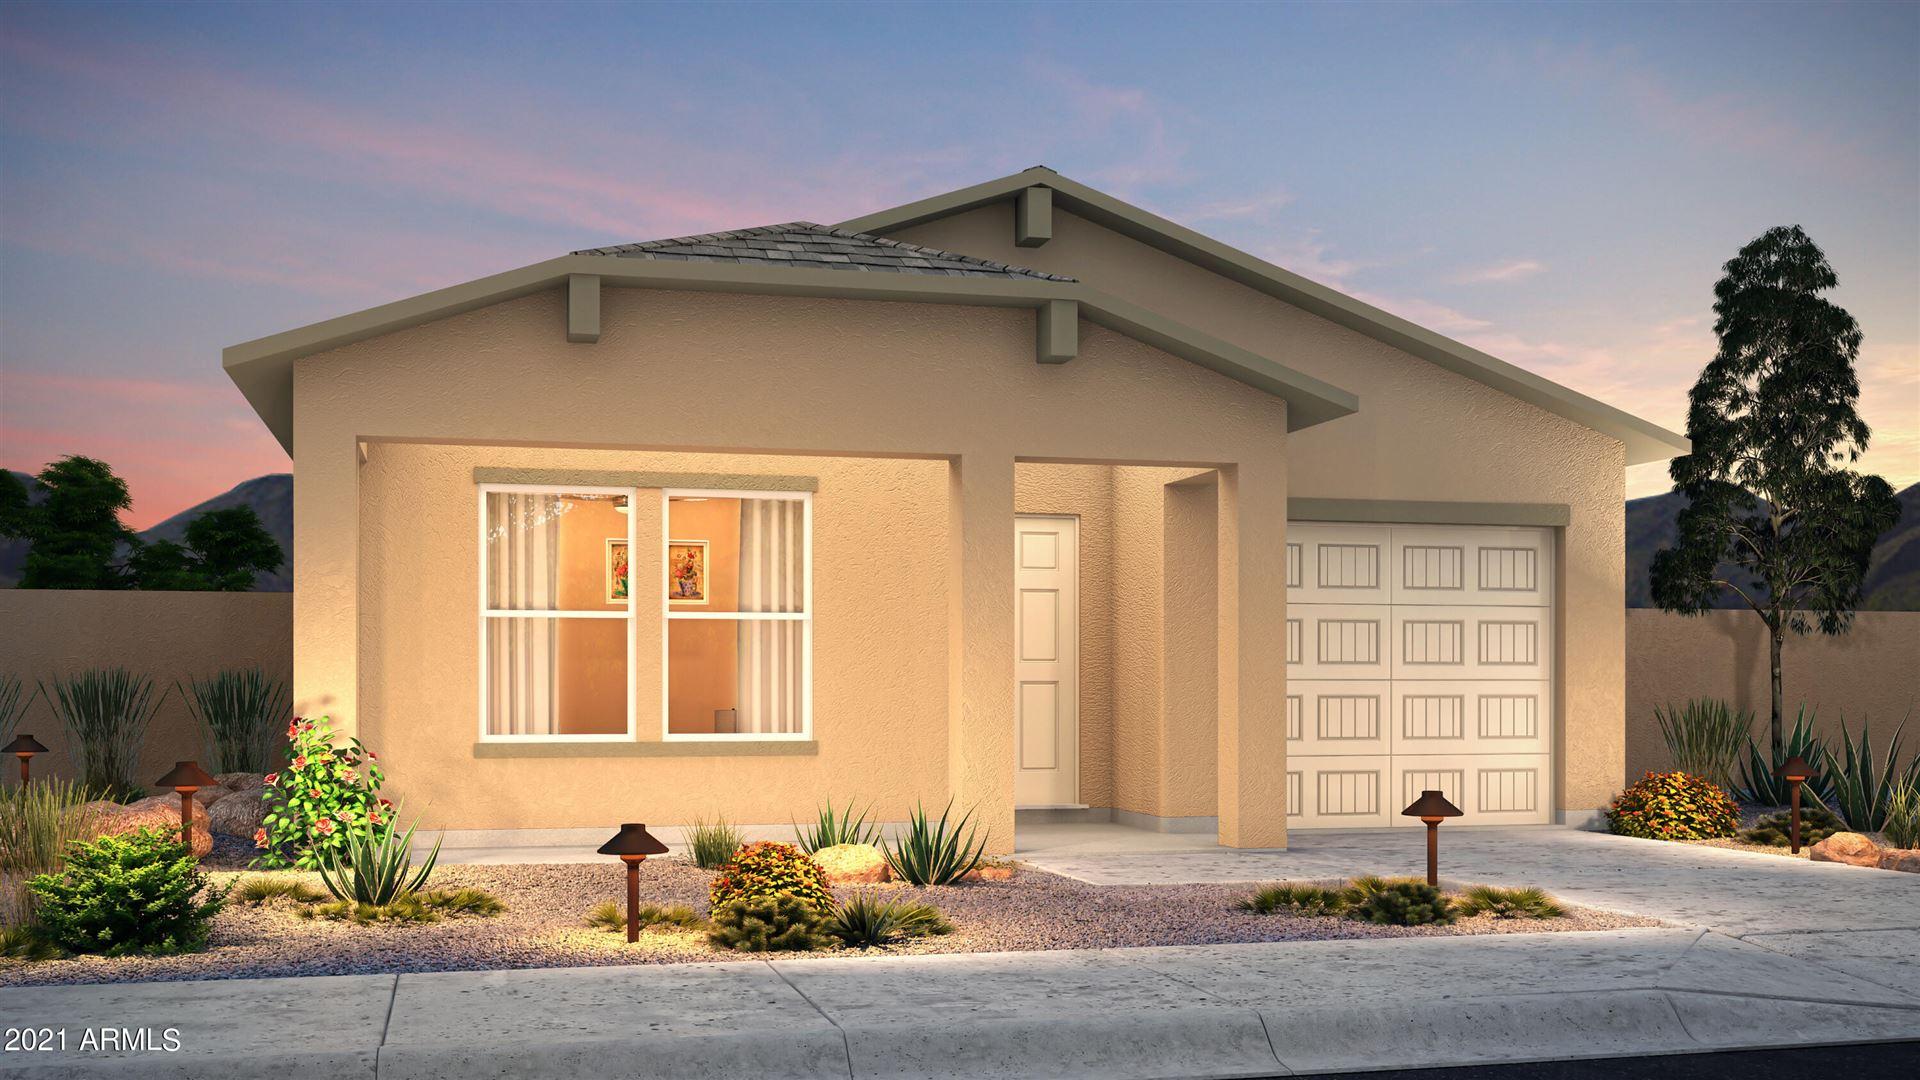 Photo of 175 ARKIN Circle, Morristown, AZ 85342 (MLS # 6262062)